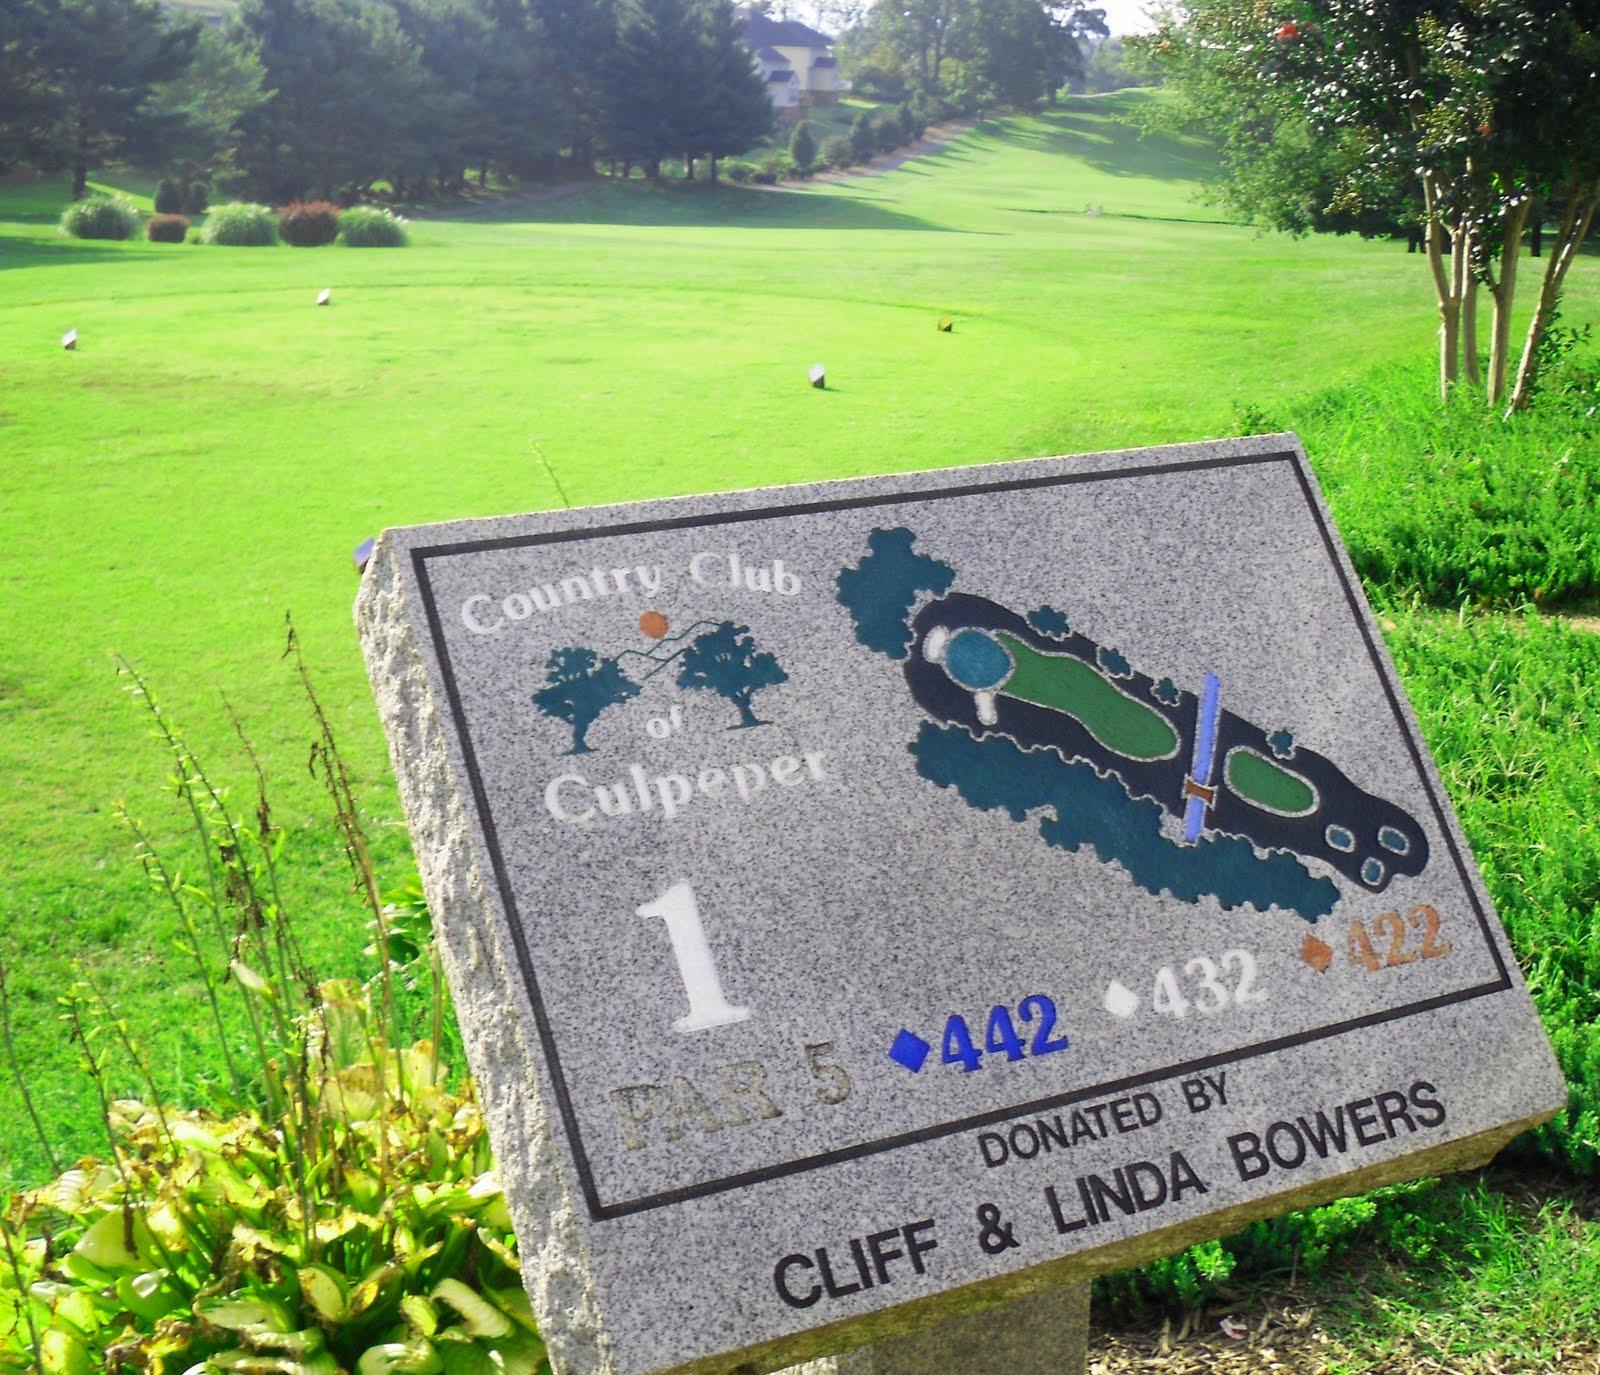 Culpeper Country Club